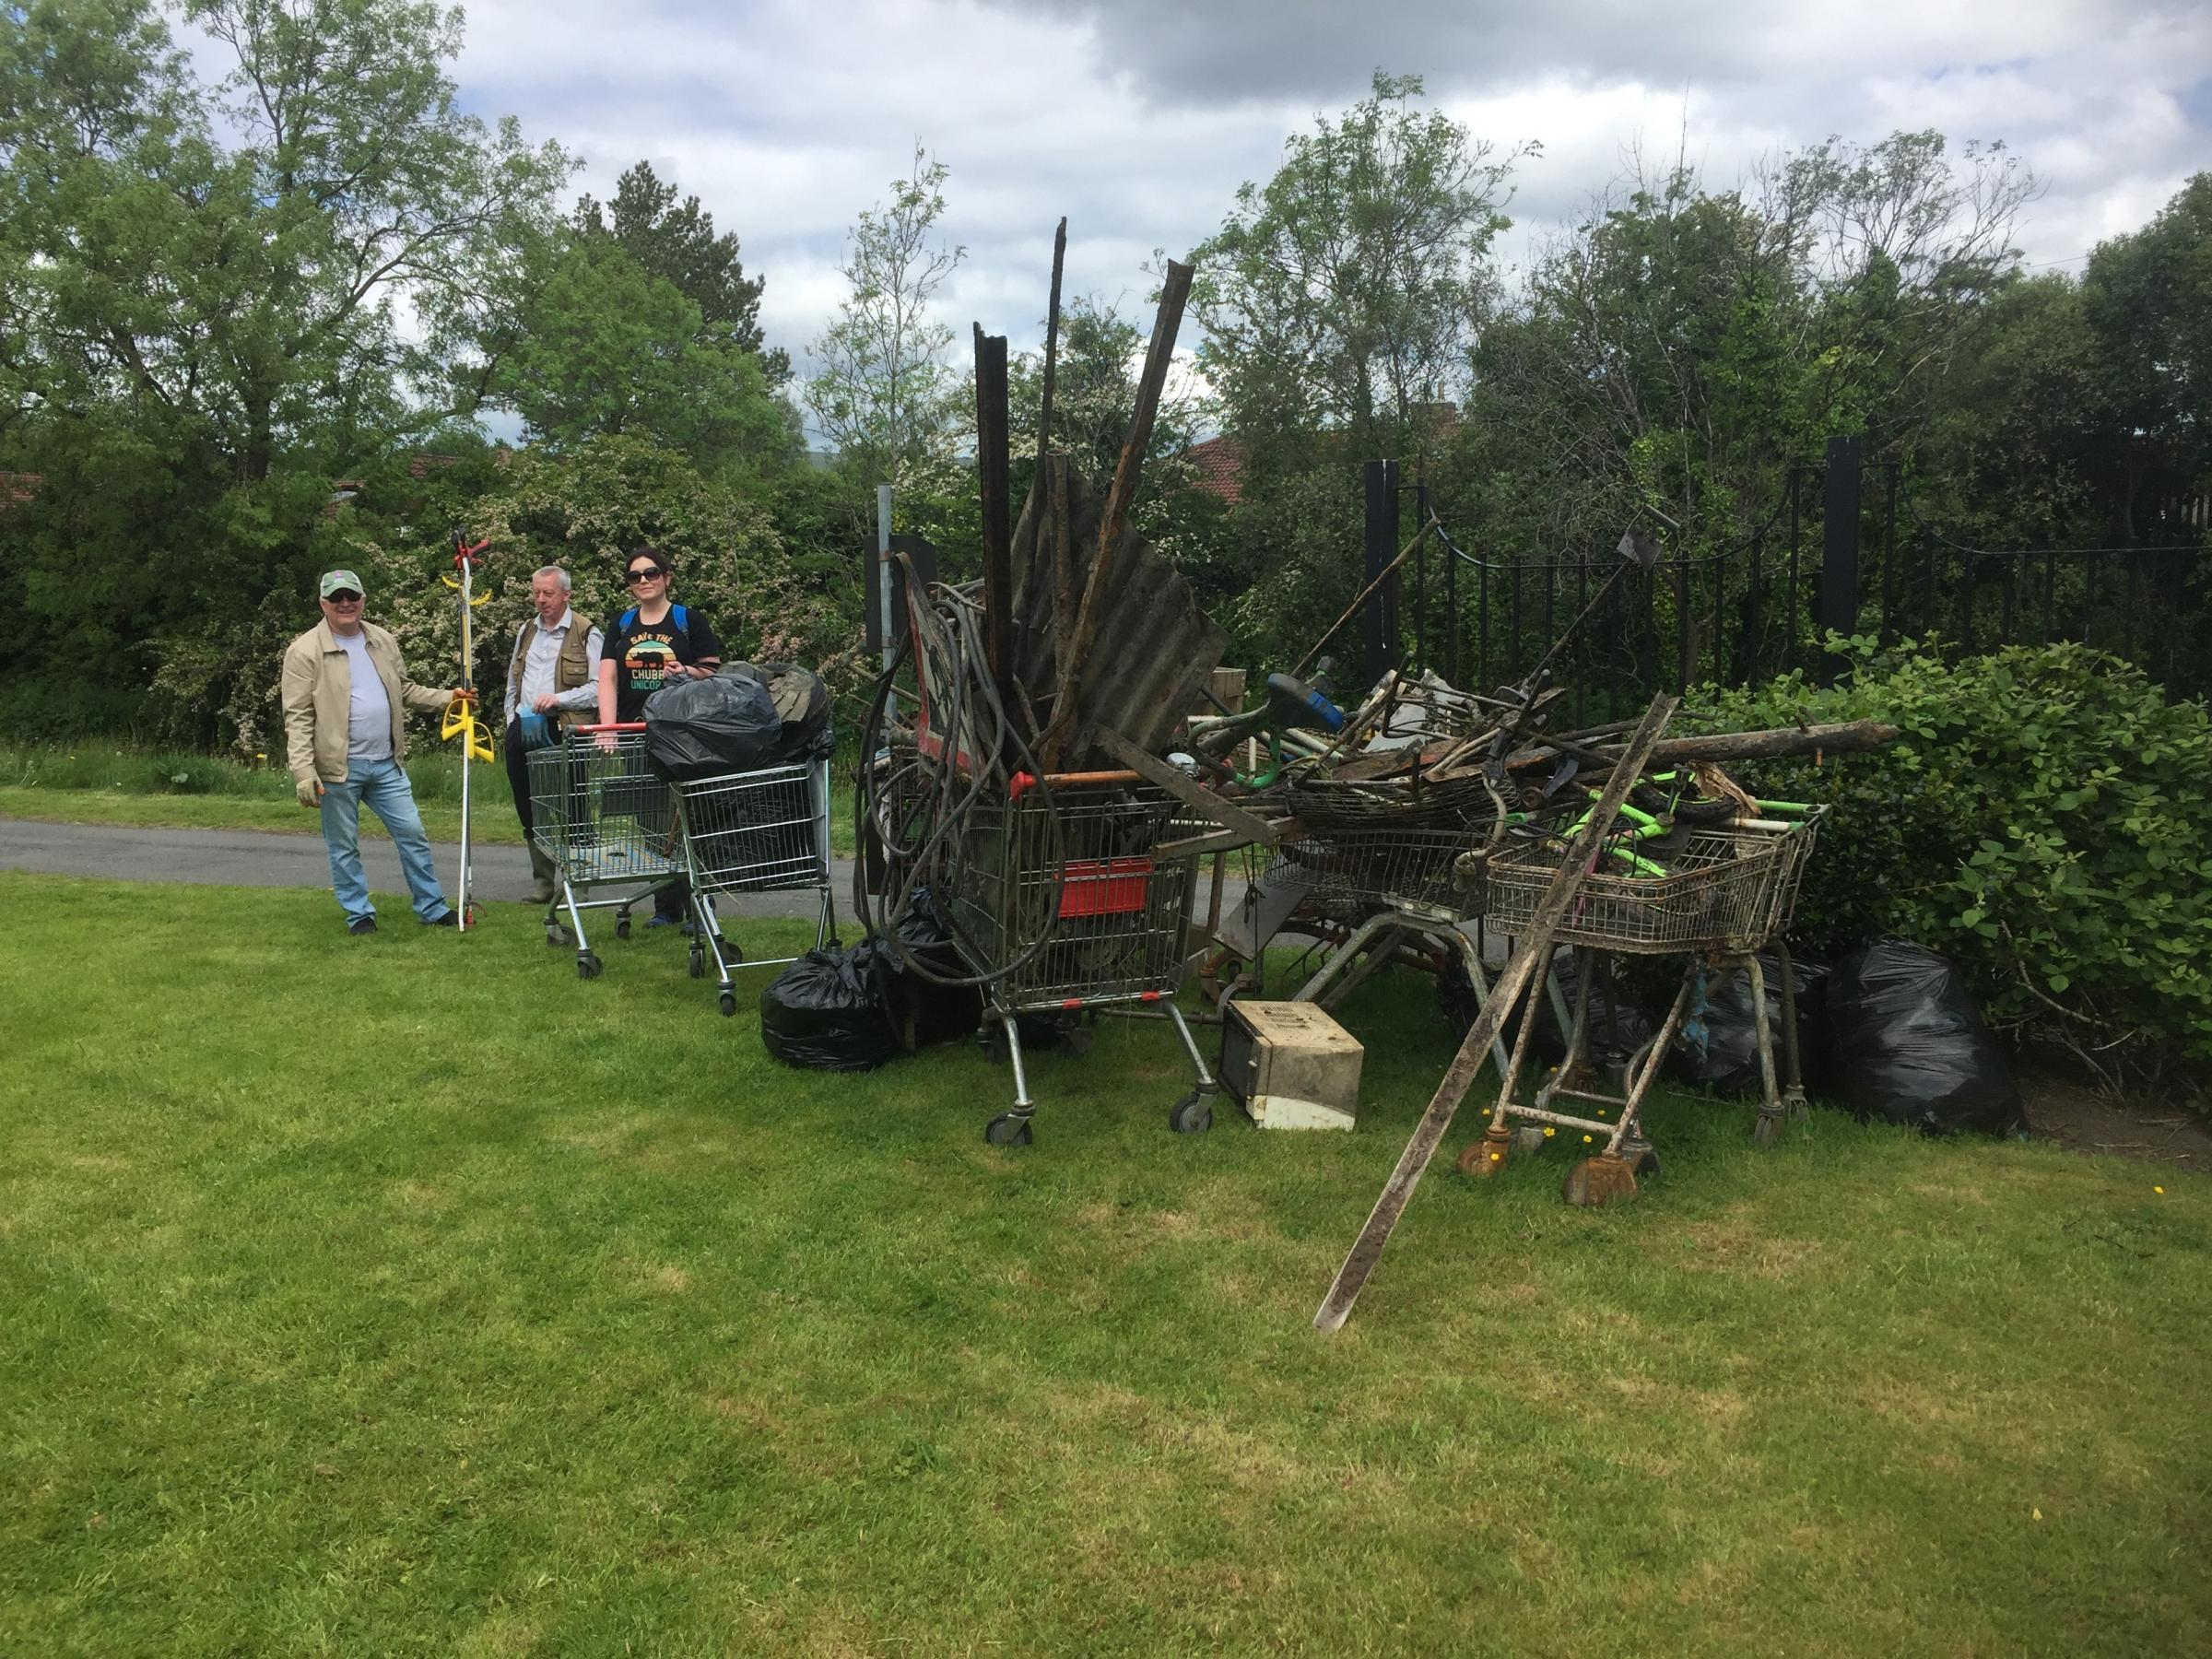 Linnvale Community Greenspace Team step up their effort to keep Clydebank tidy